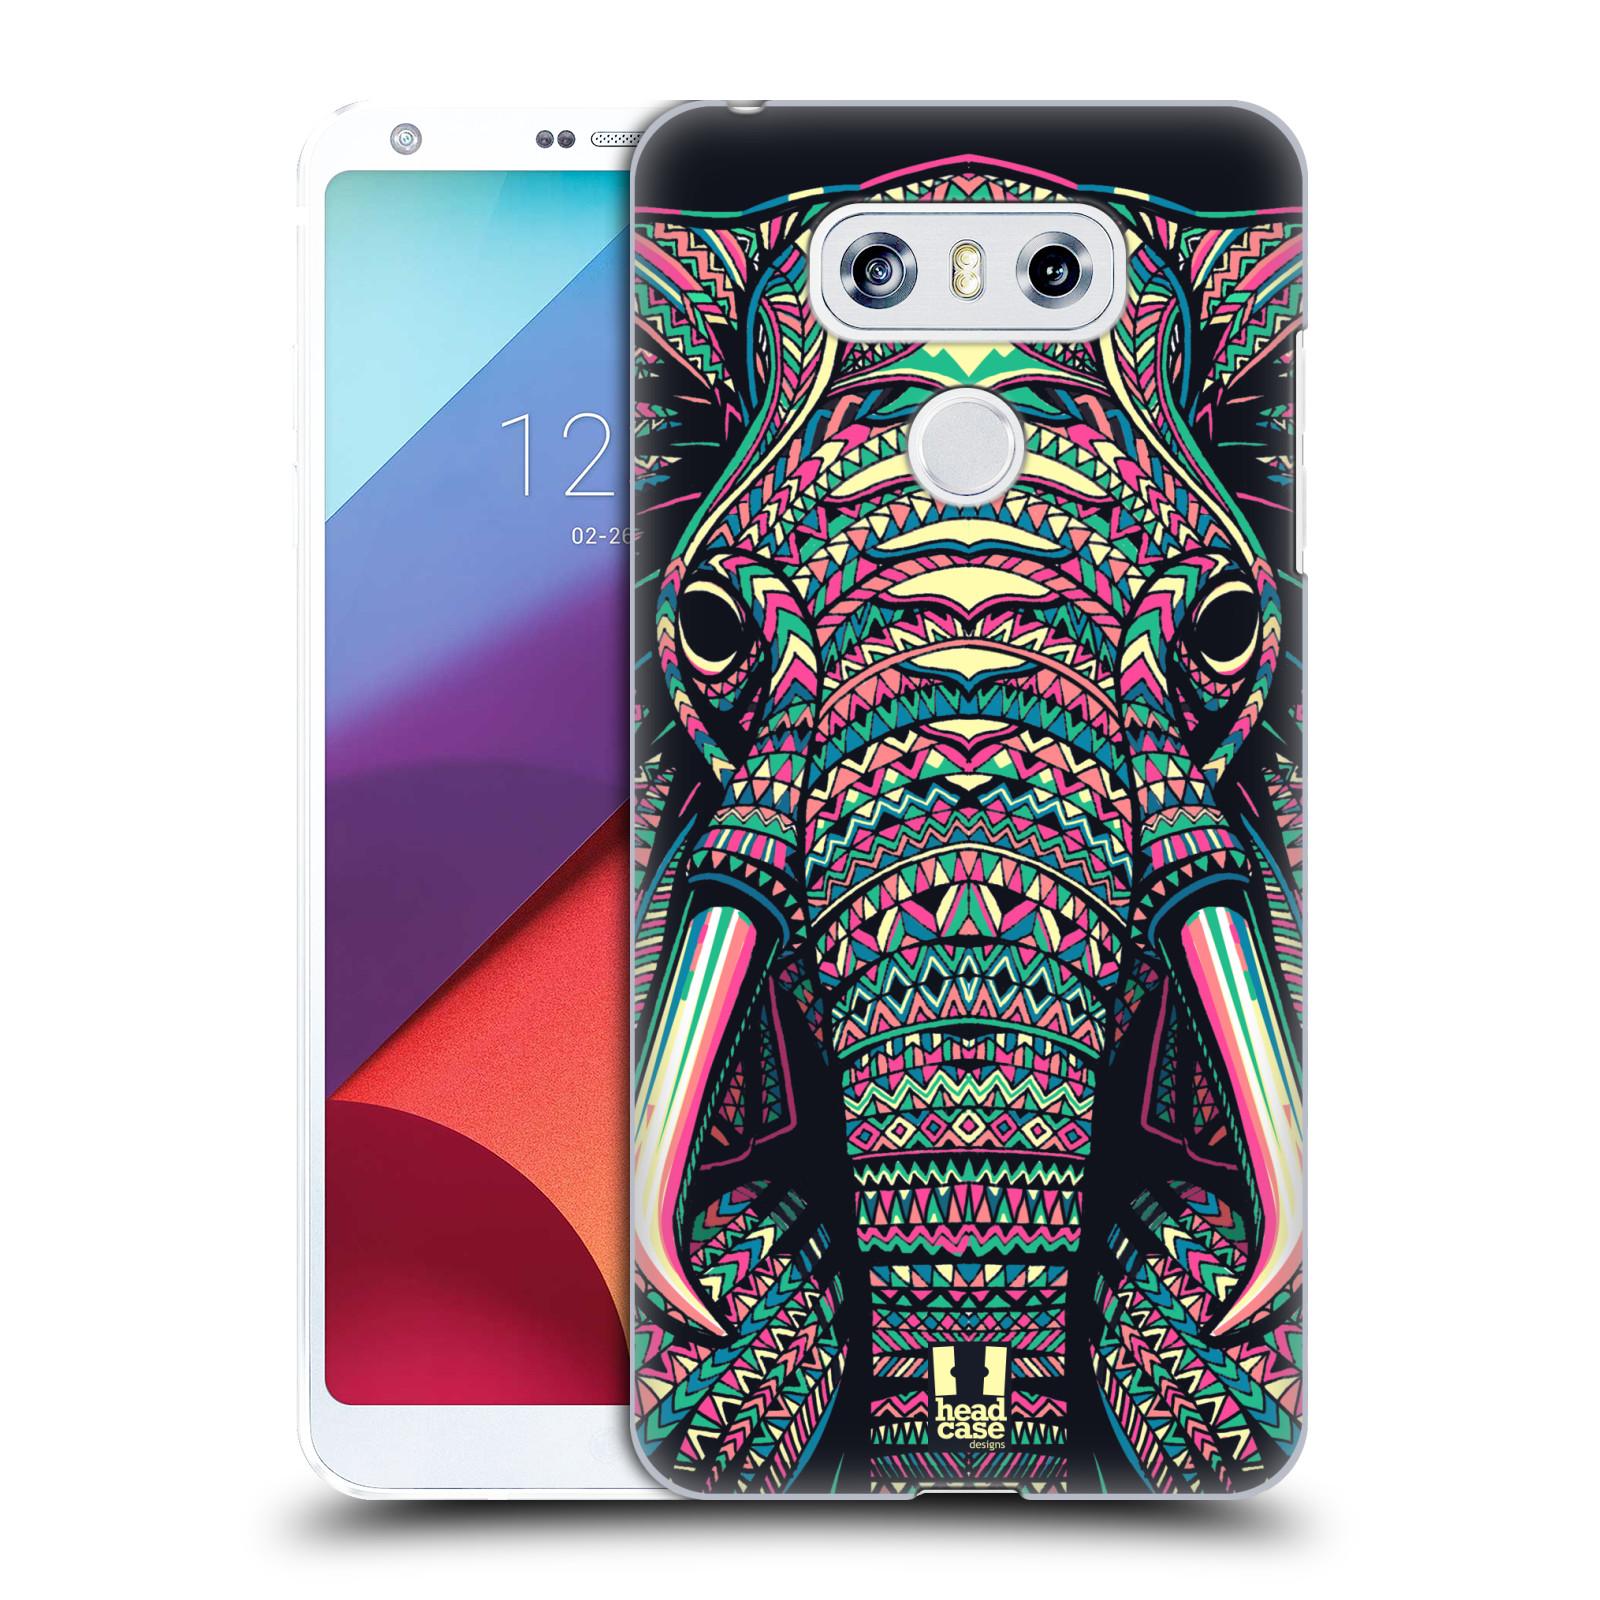 Plastové pouzdro na mobil LG G6 - Head Case AZTEC SLON